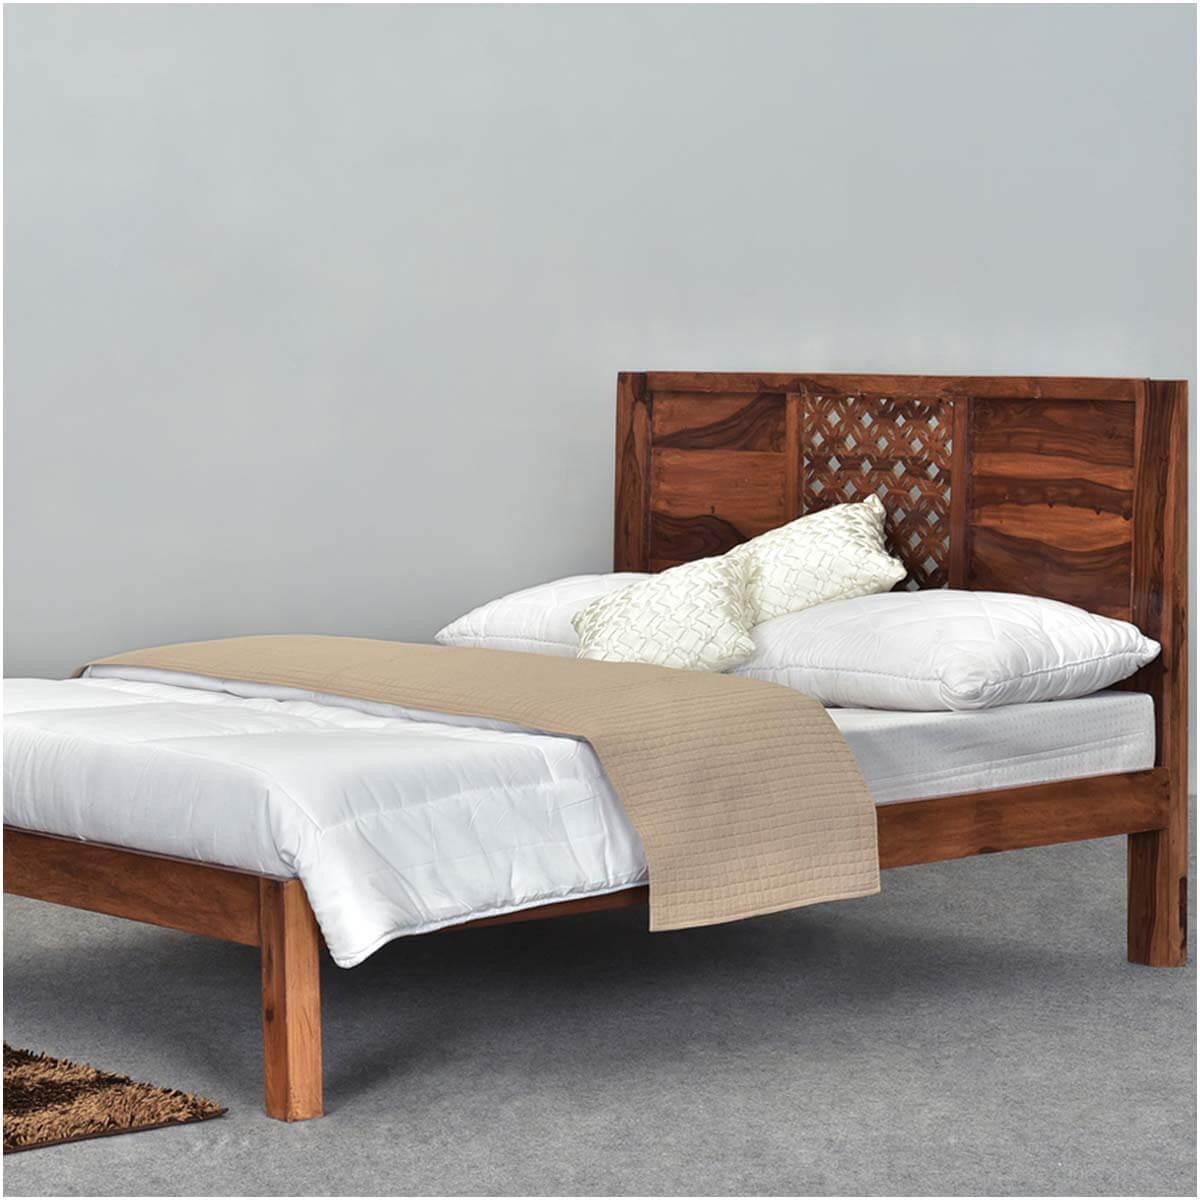 buy online 851f6 7c75a Diamond Lattice Solid Wood Rustic Platform Bed Frame w Headboard